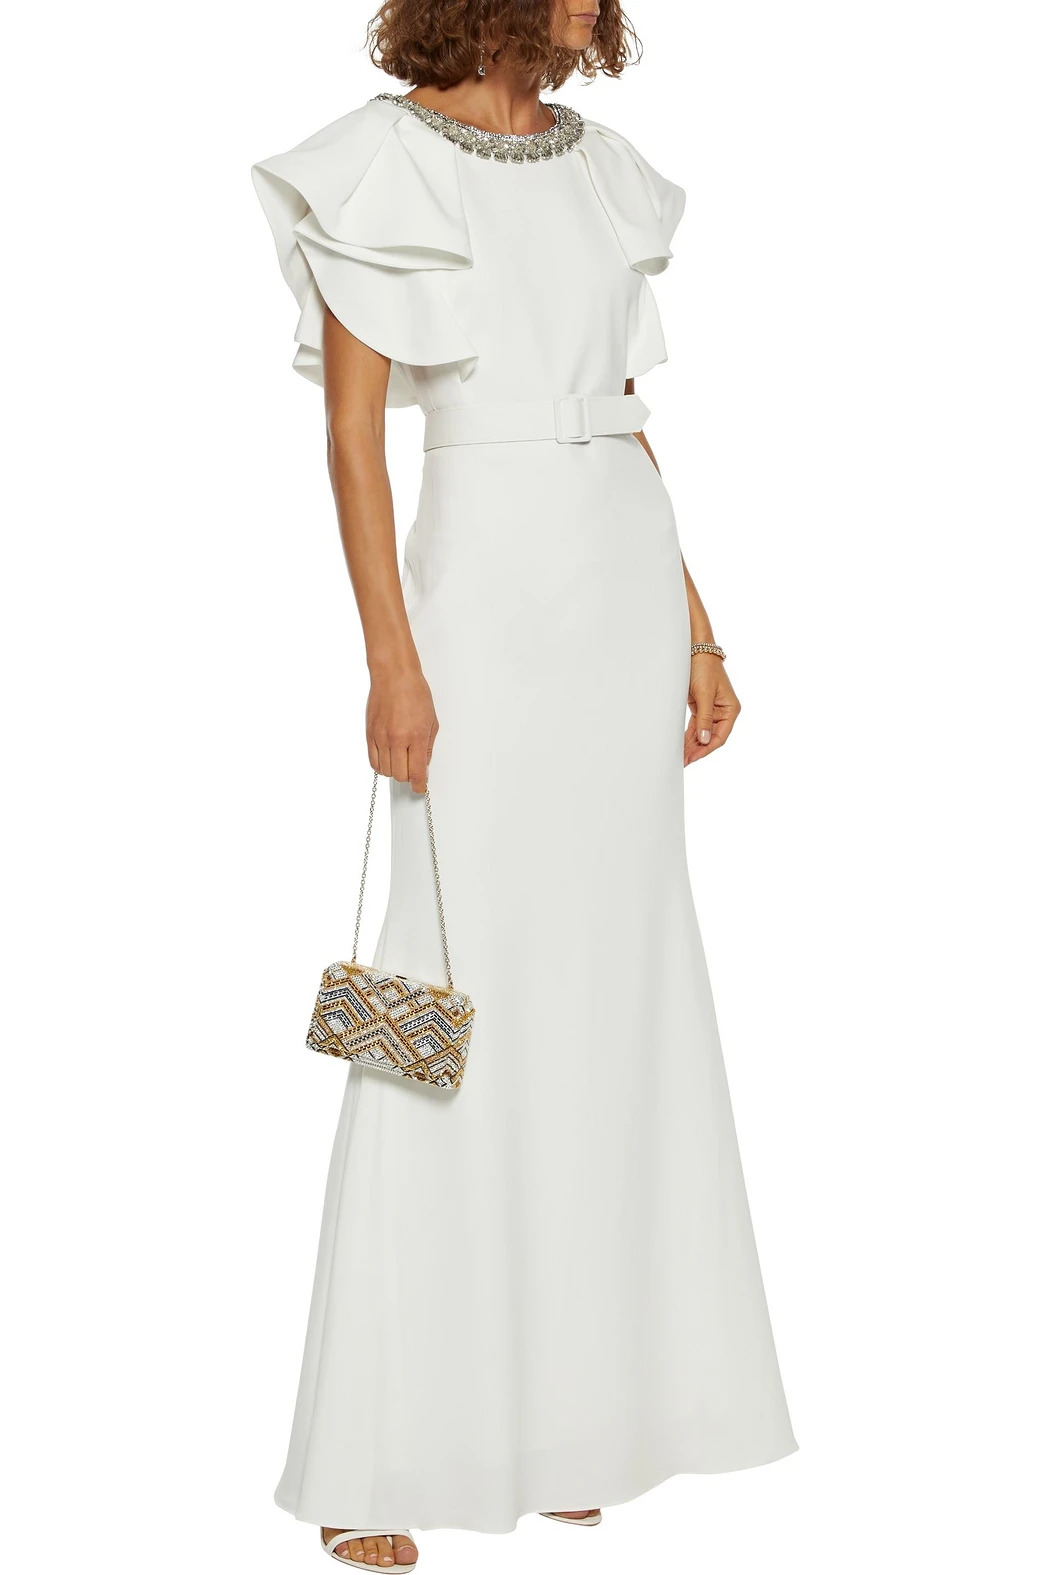 badgley mischka embellished wedding dress